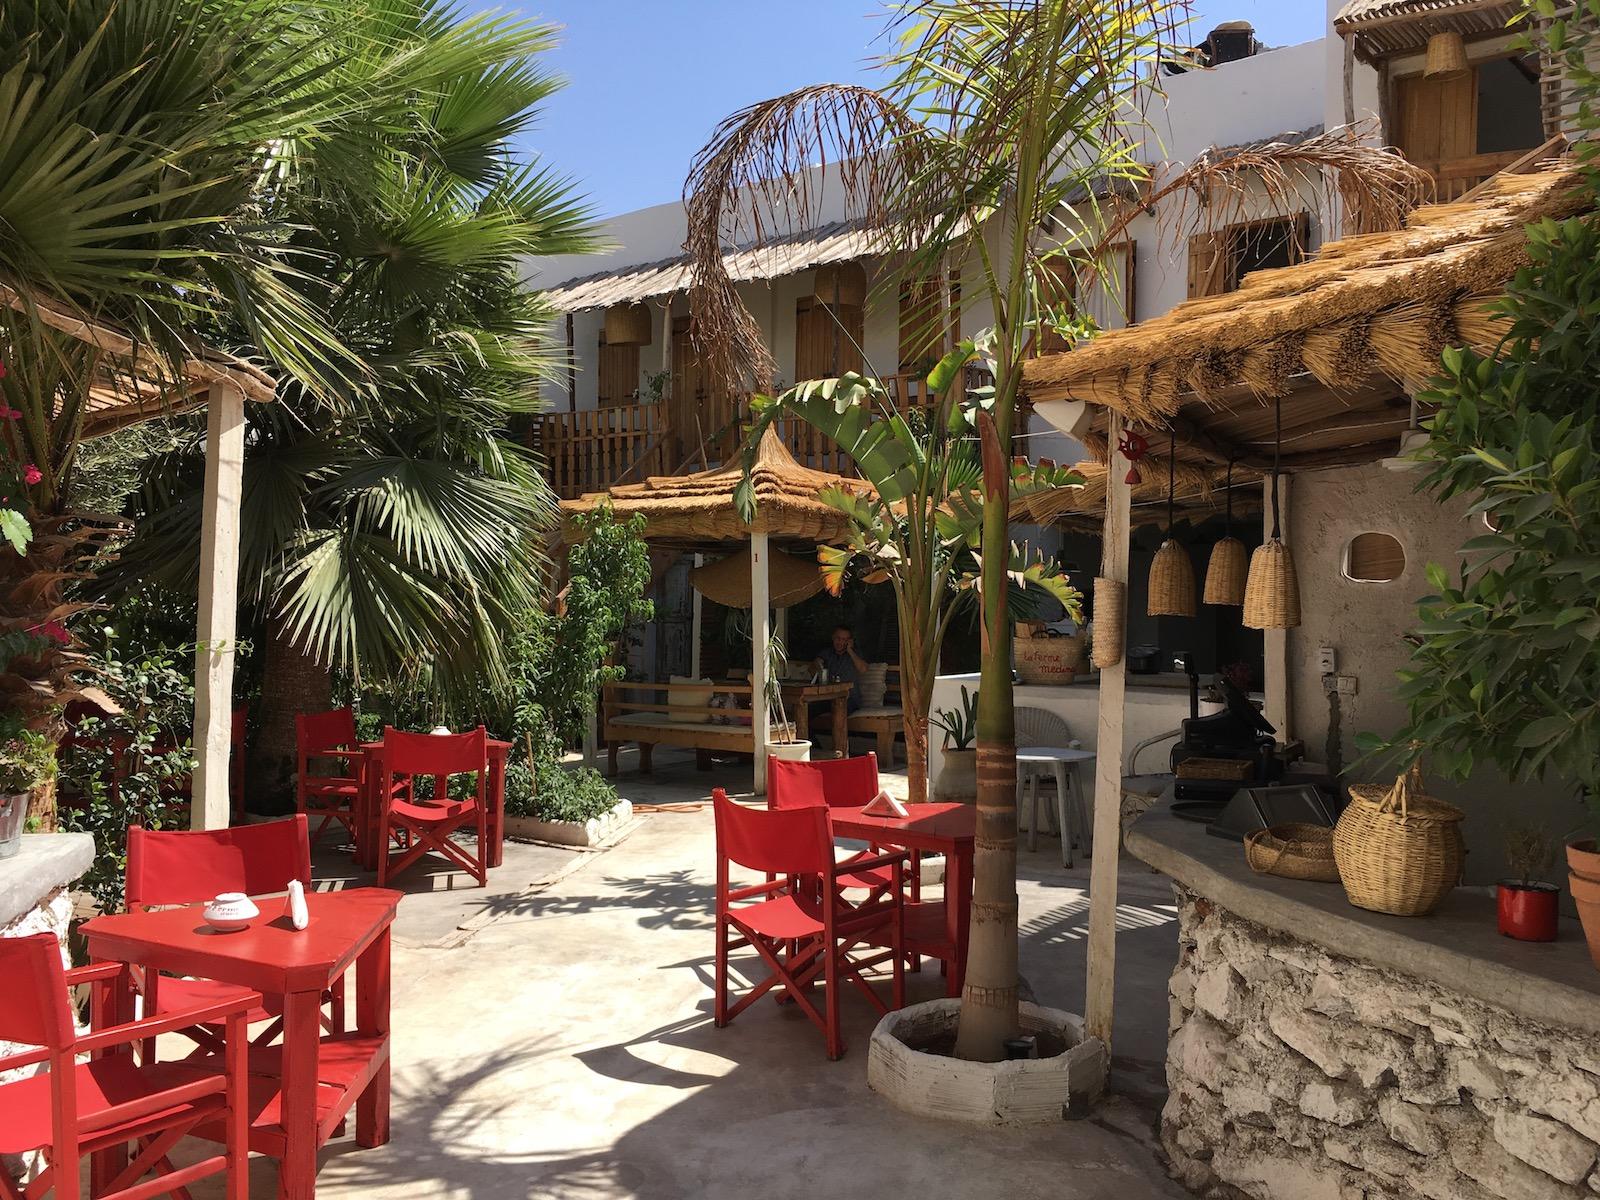 Marrakech restaurant La Ferme Medina